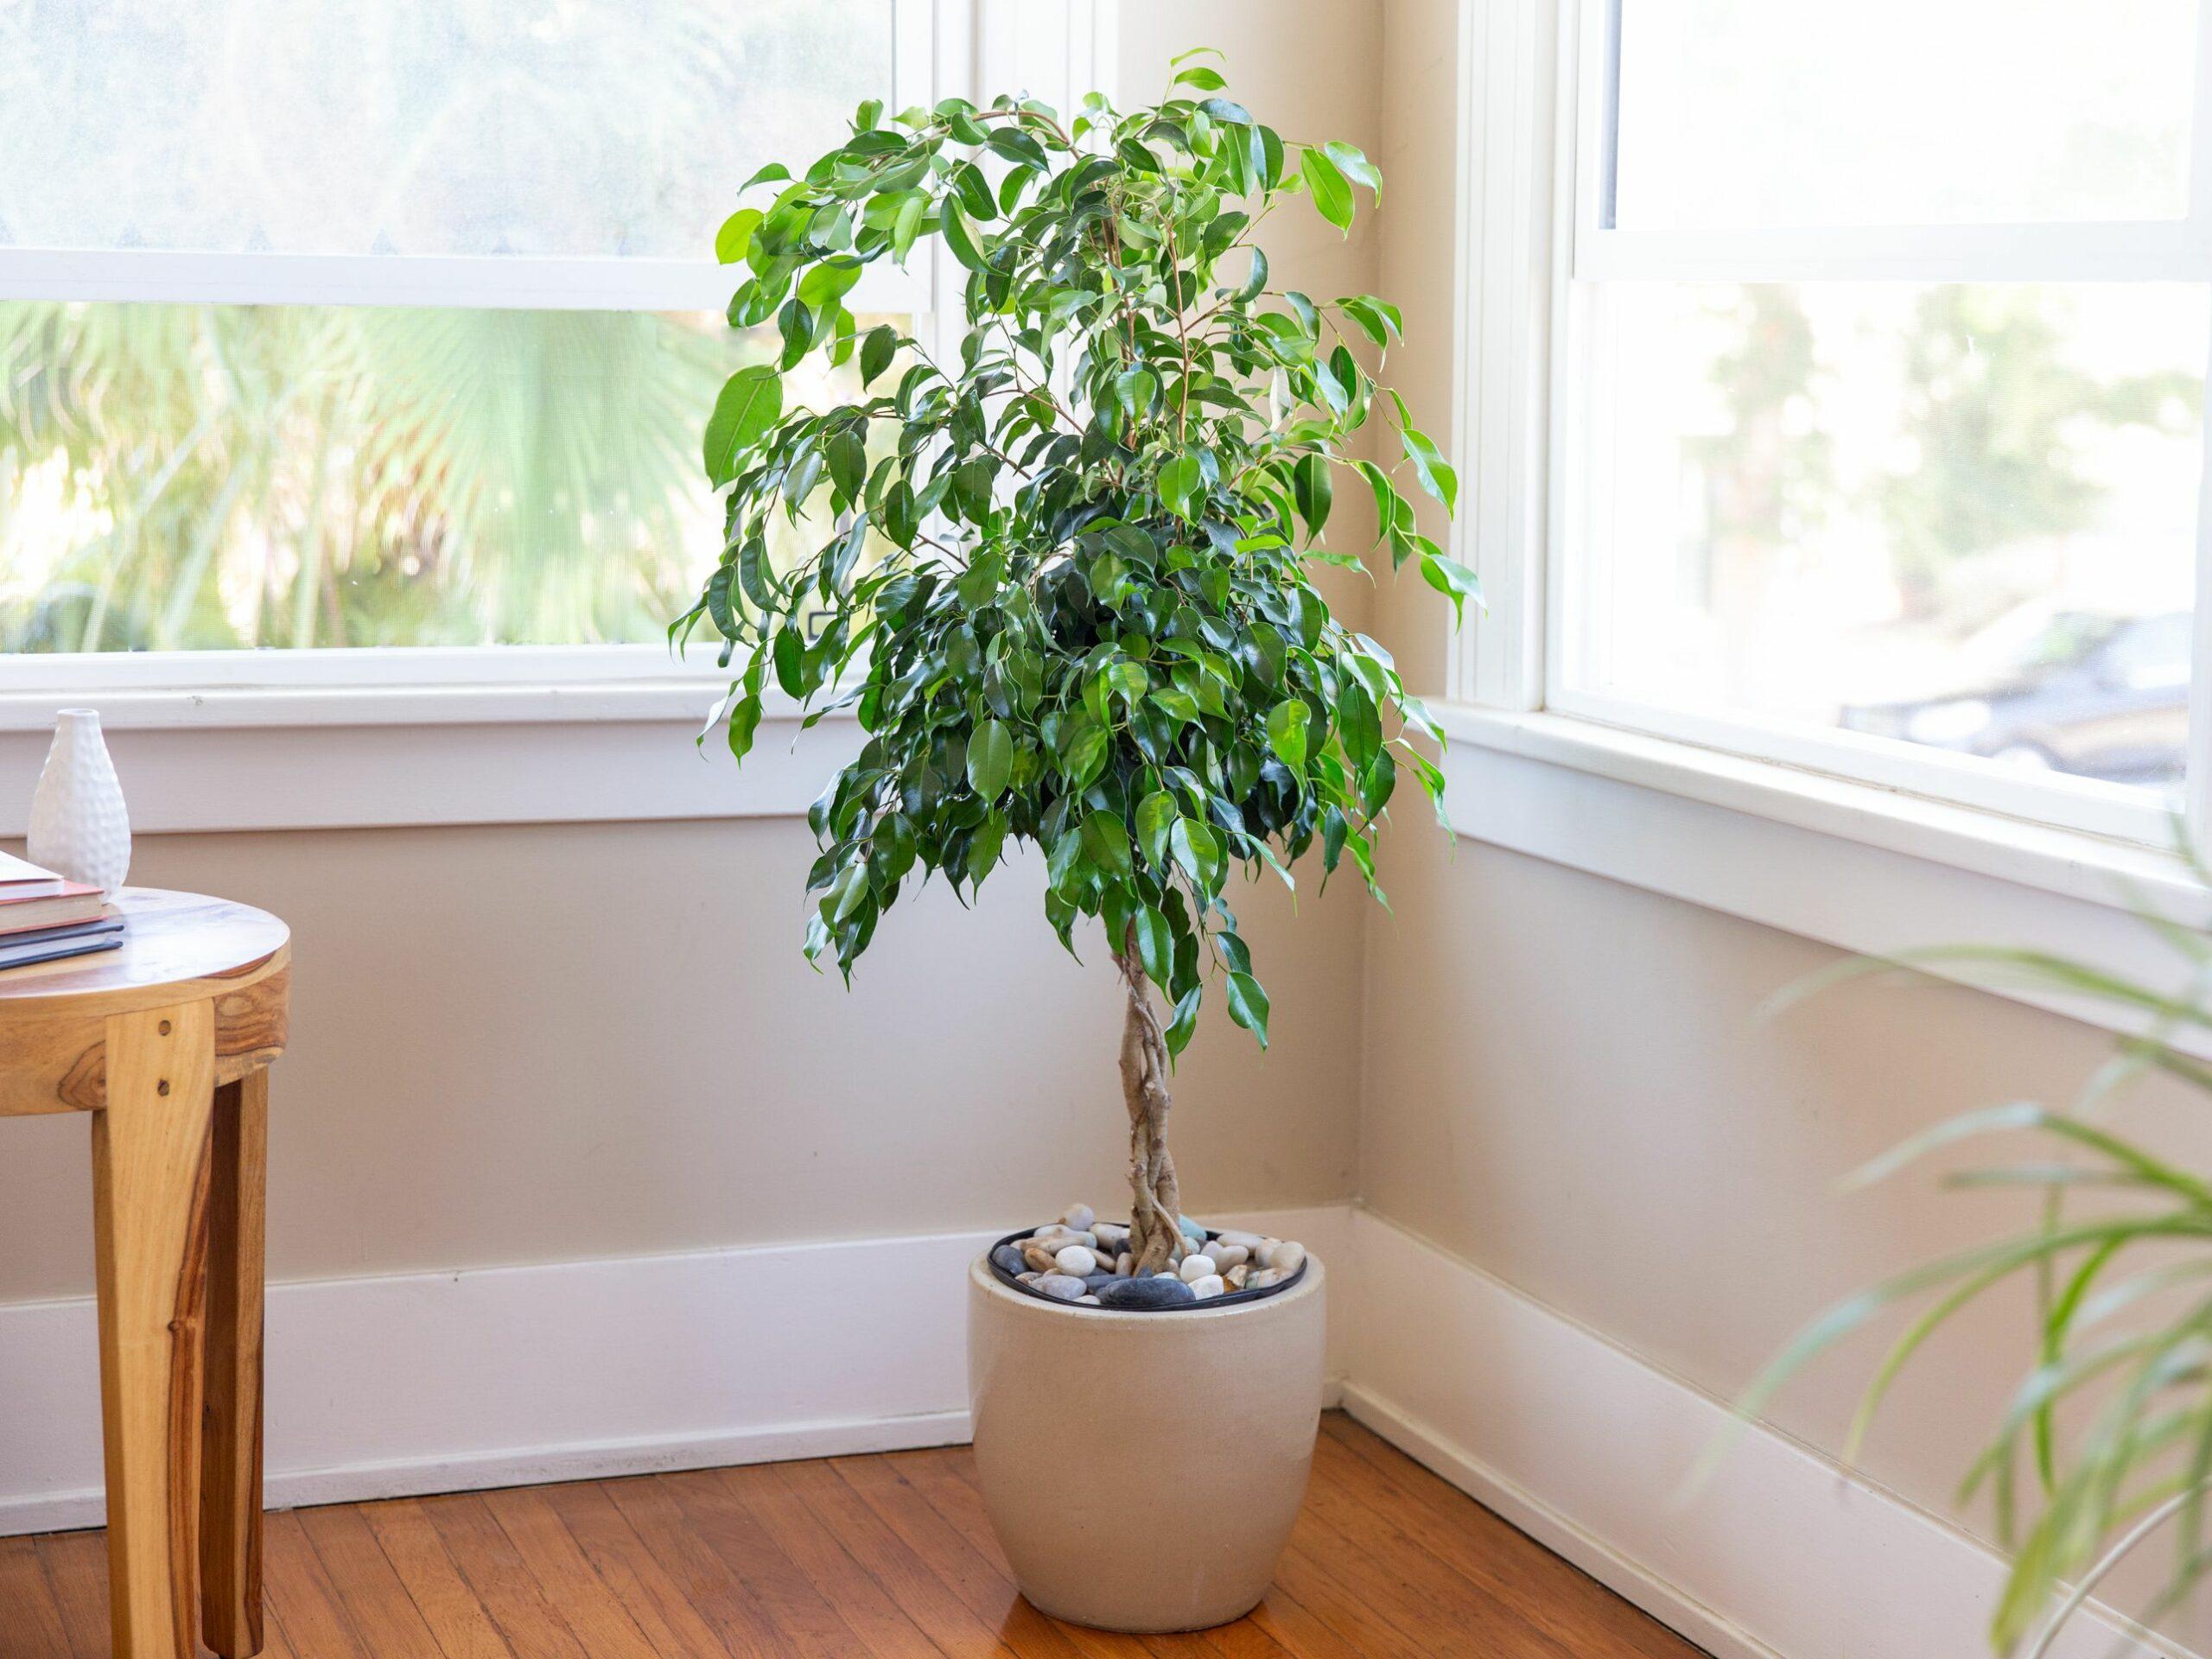 grow ficus trees 1902757 1 80b8738caf8f42f28a24af94c3d4f314 scaled